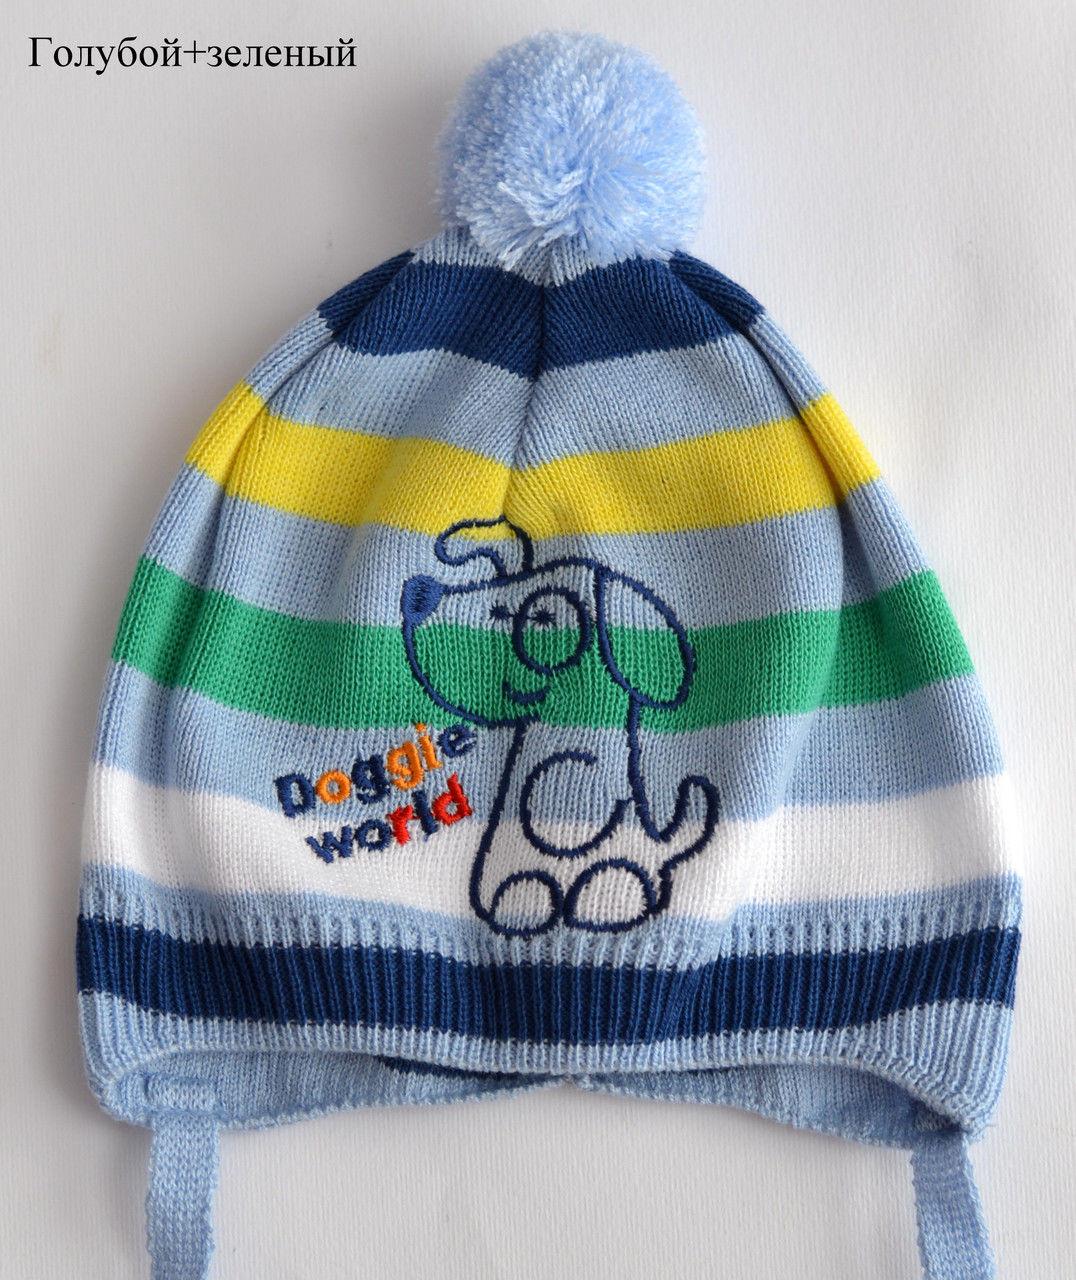 Легкая детская шапочк на 9 месяцев